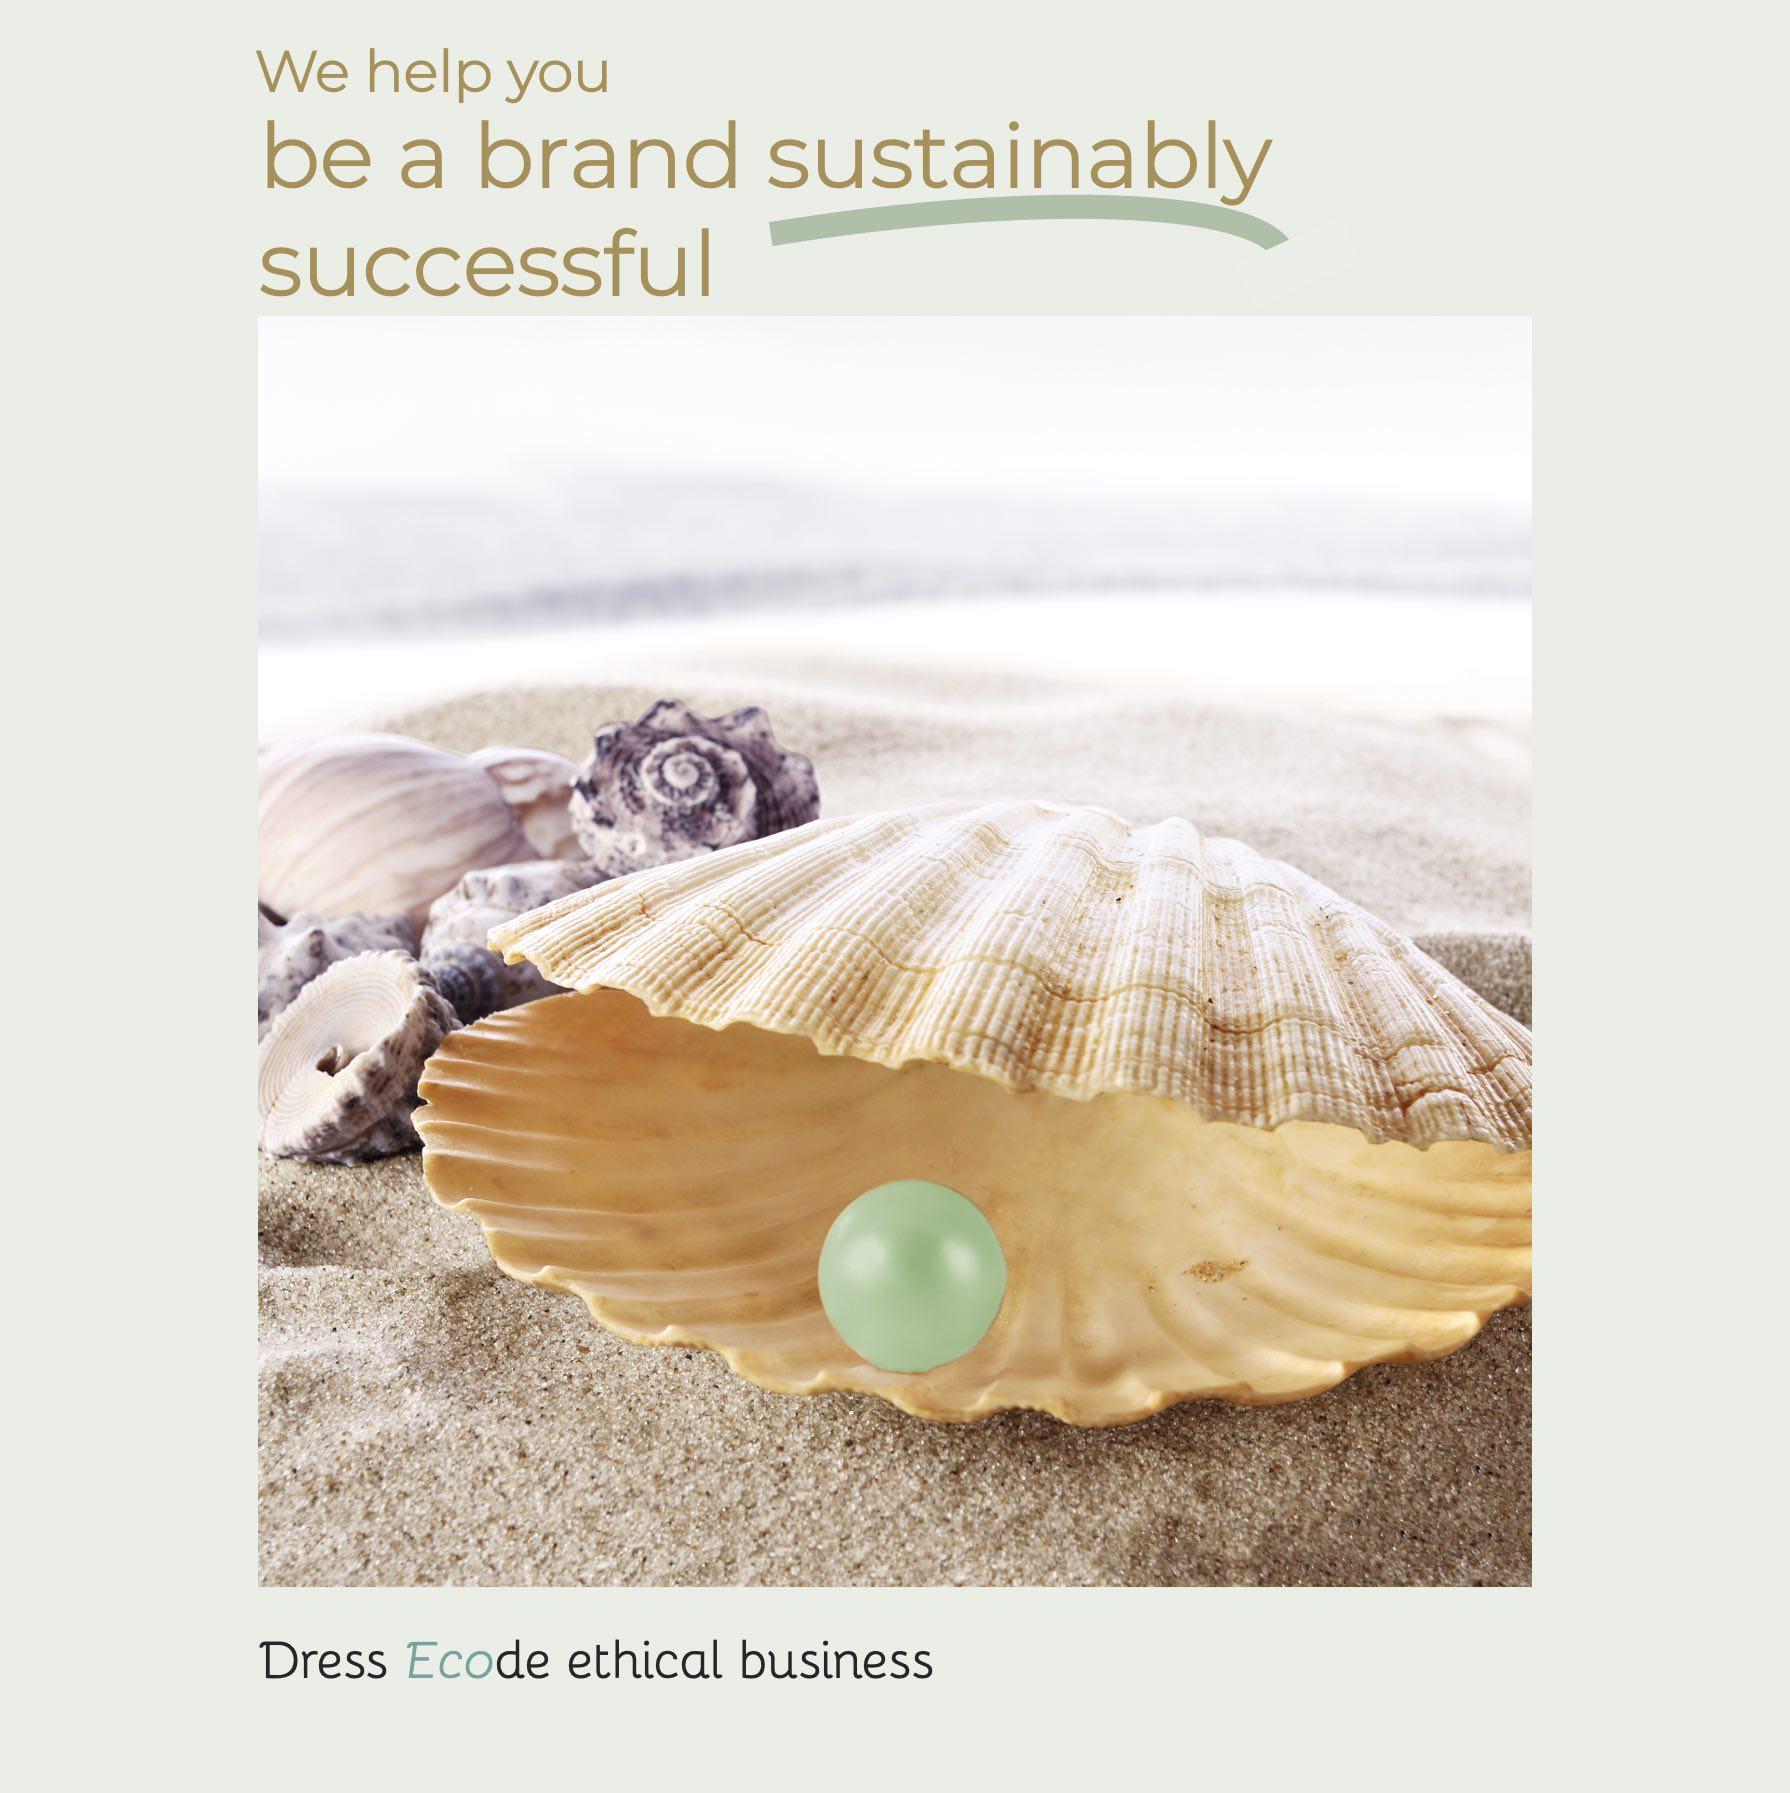 DE Ethical Business verde